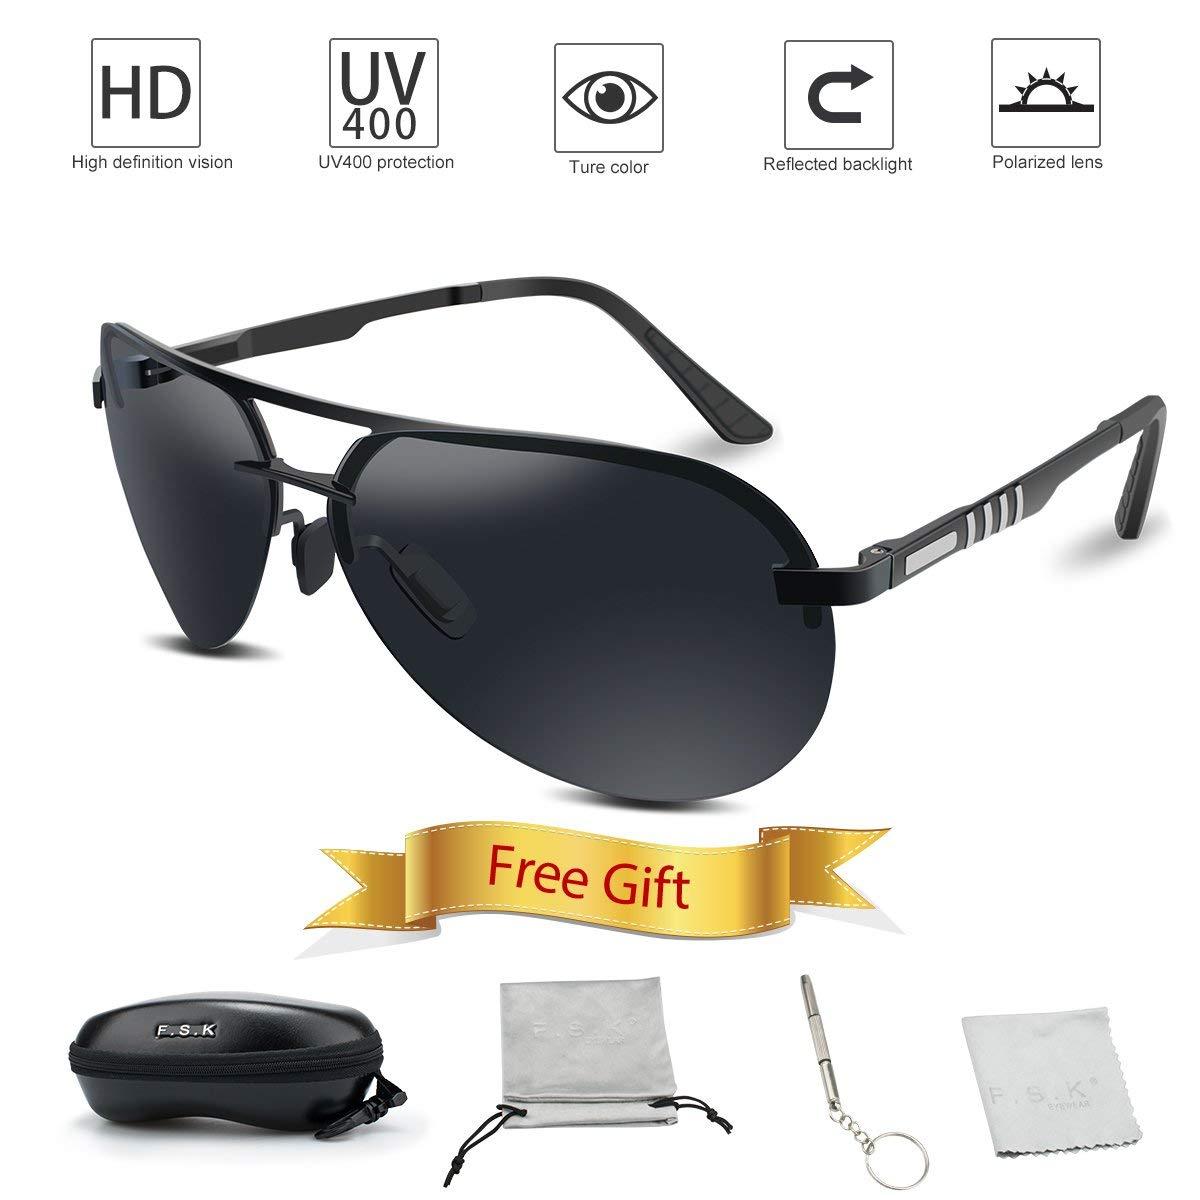 cb382ca1c37c Get Quotations · FSK Sunglasses for Men Aviator Driving Polarized Sunglasses  Al-Mg Metal Frame Ultra Light